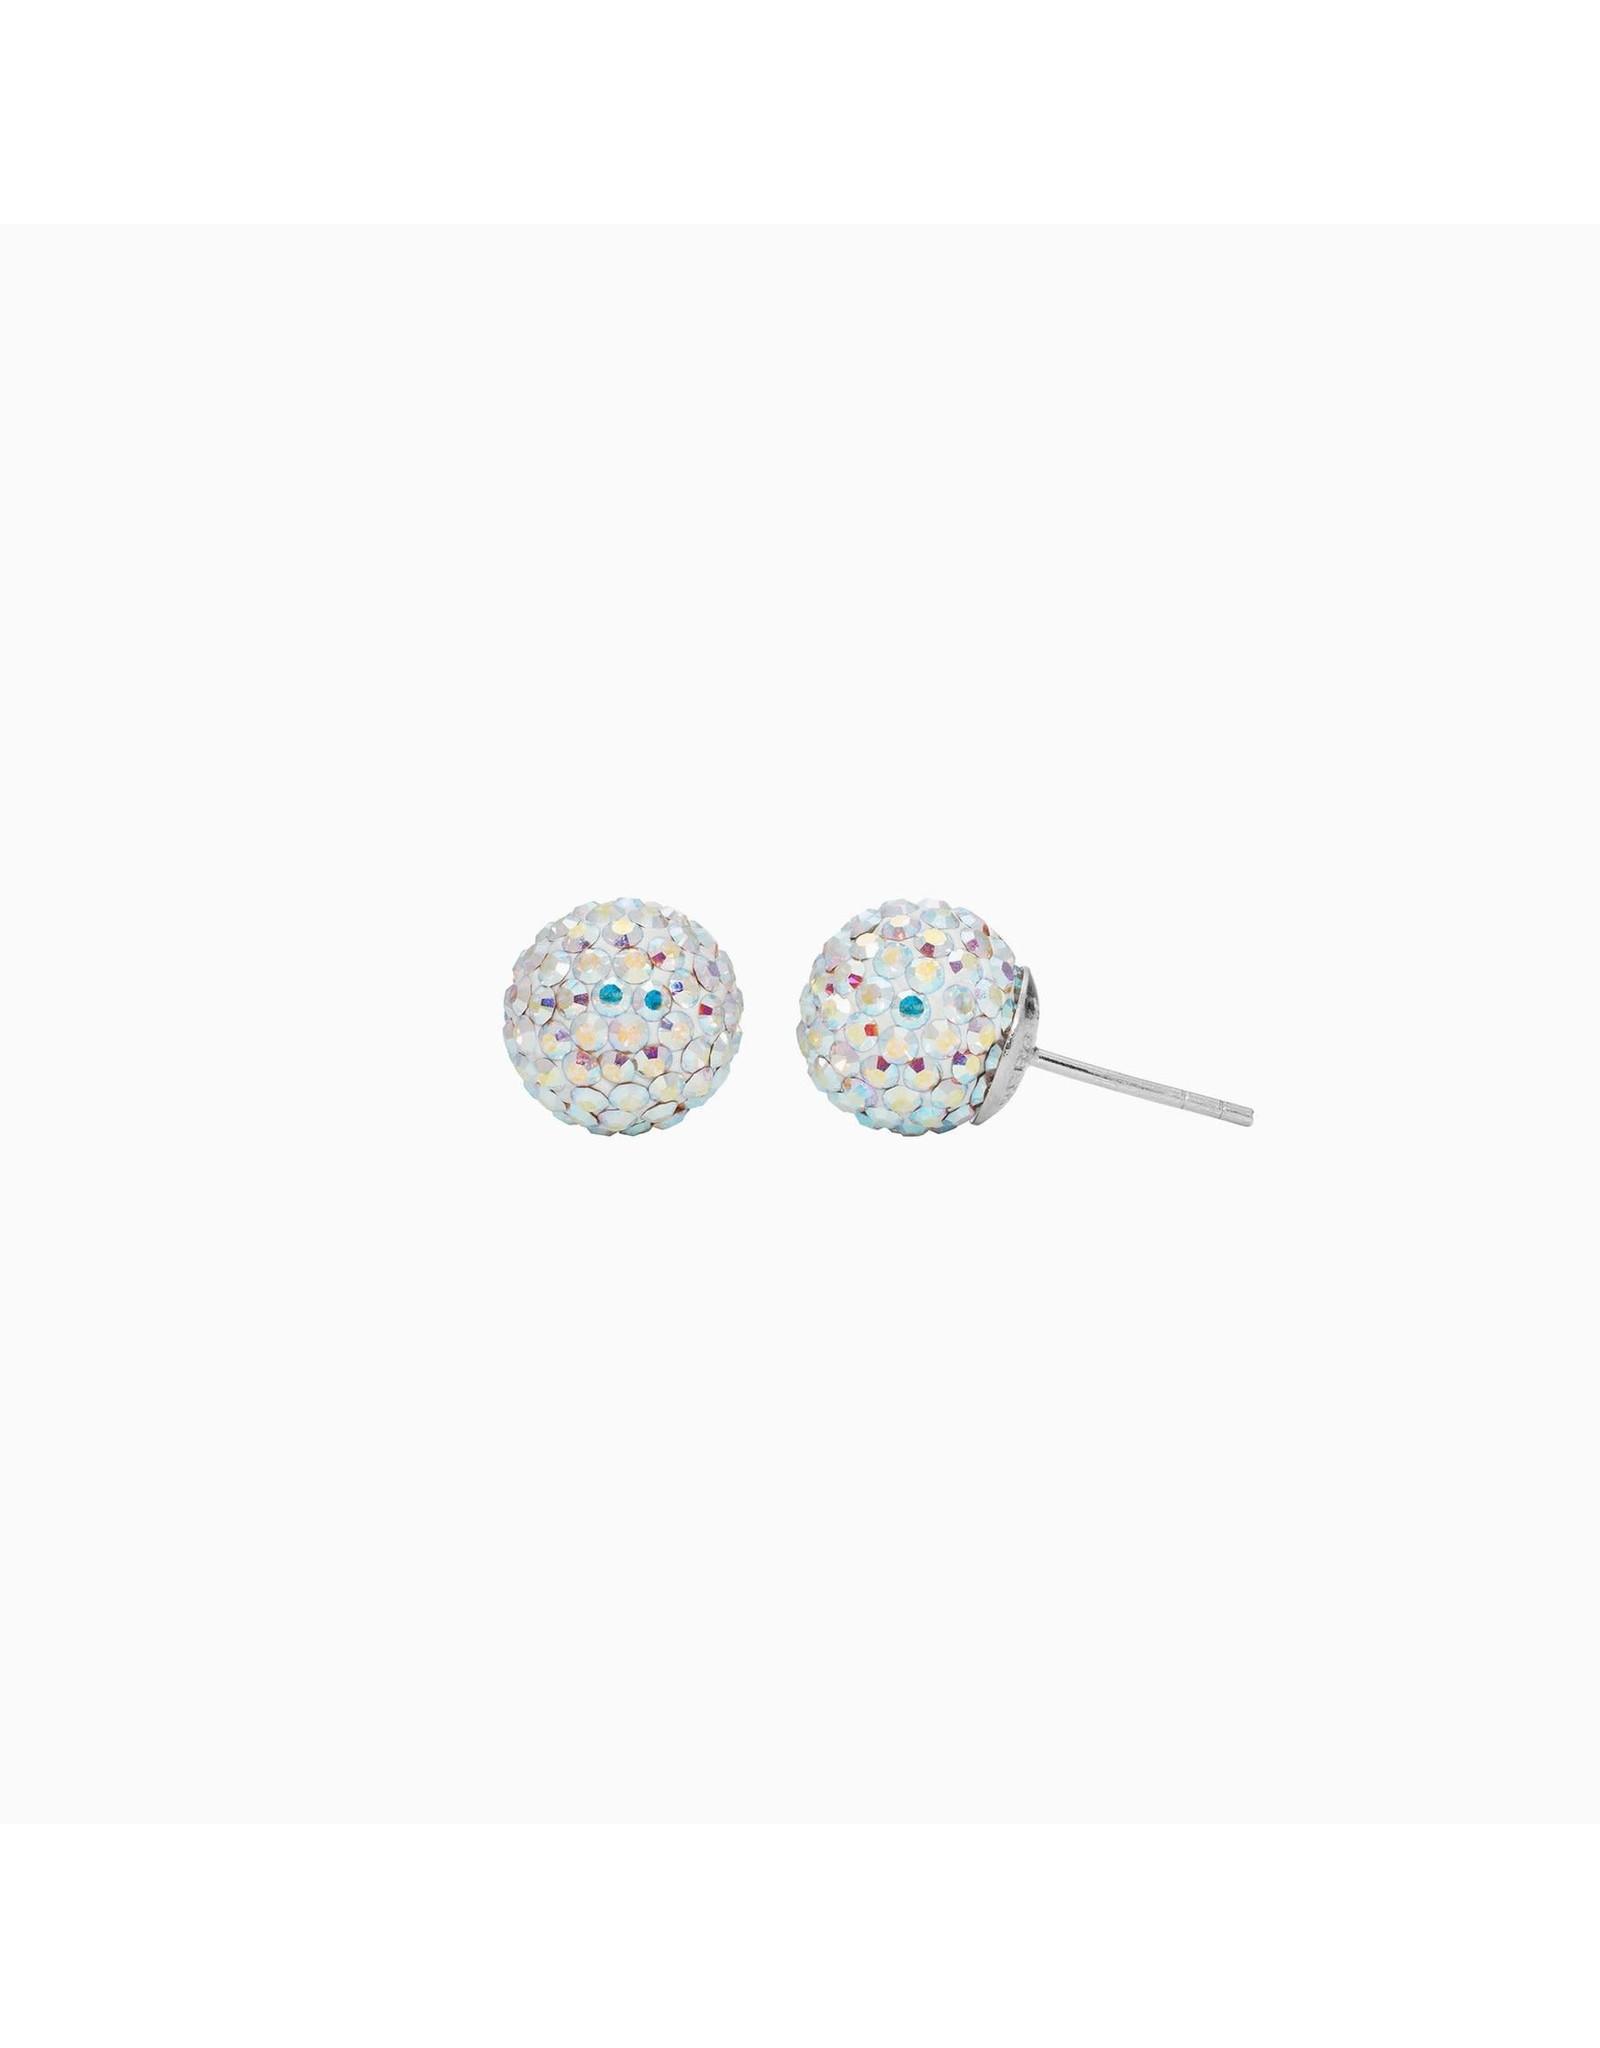 Hillberg & Berk Hillberg & Berk Aurora Borealis 10mm Sparkleball Studs